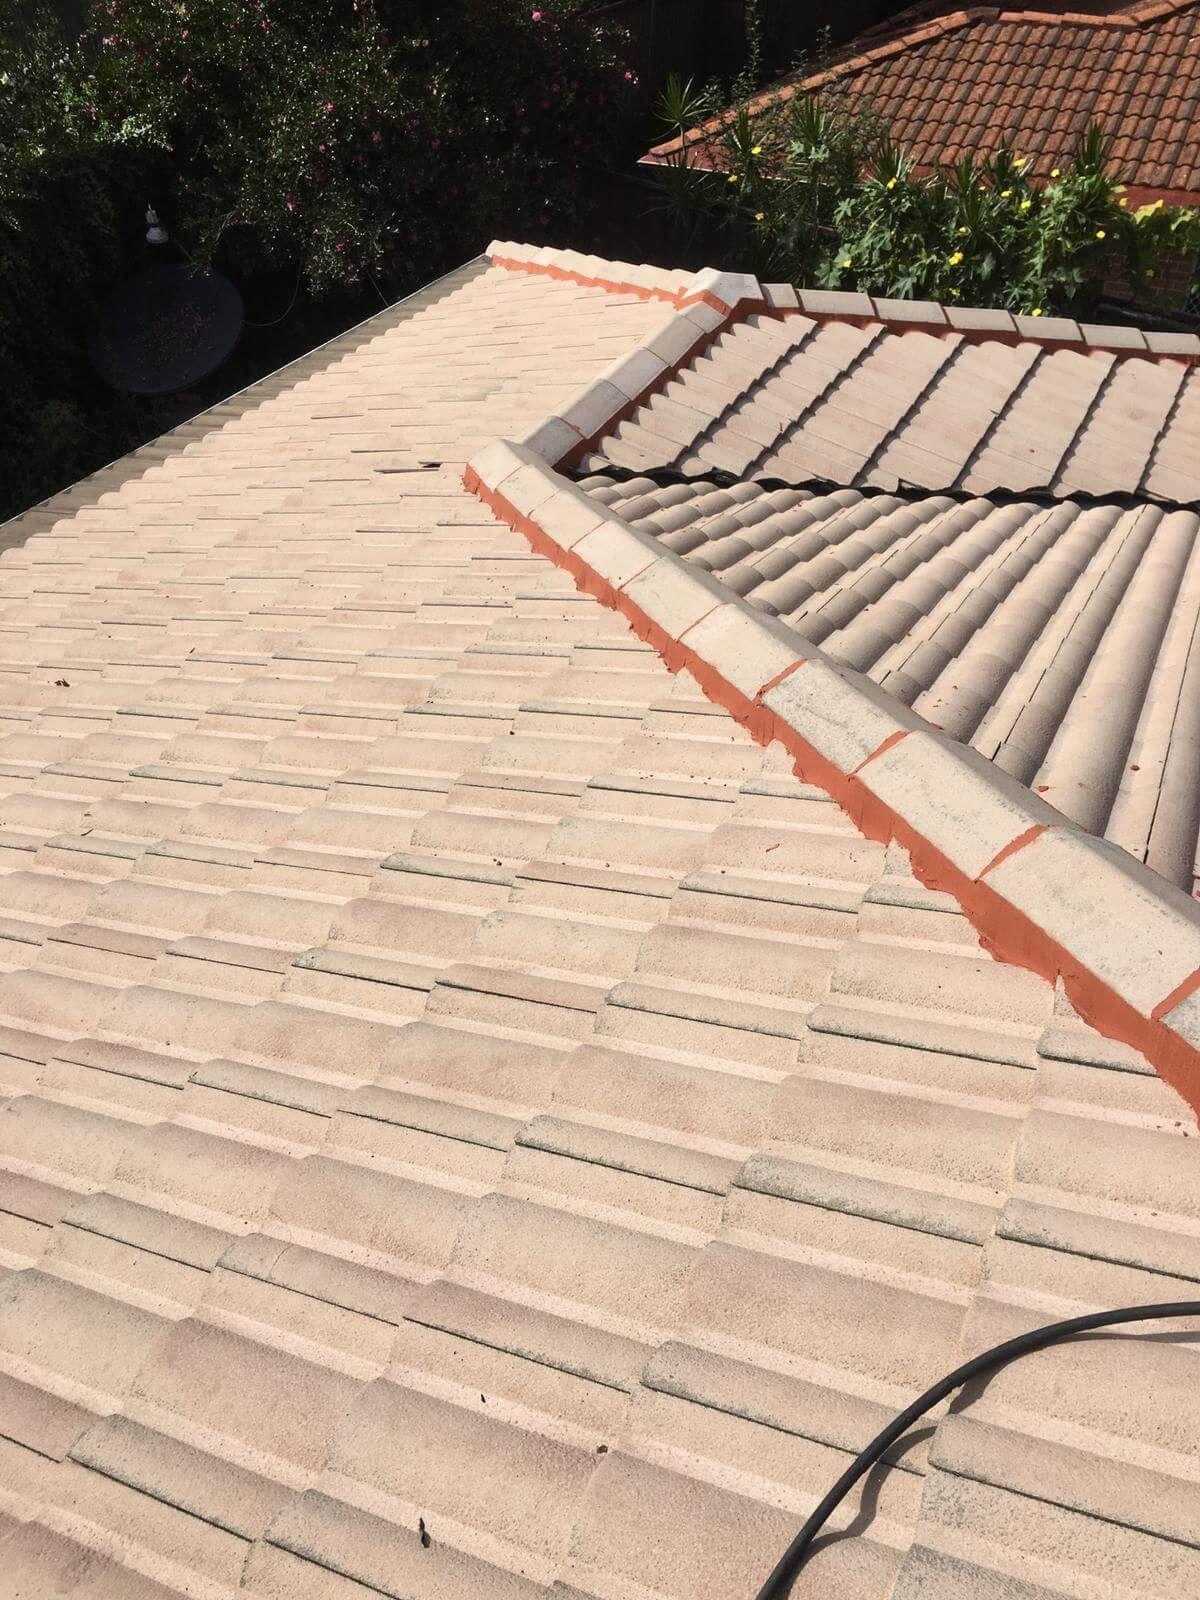 Roof Repairs In Sydney In 2020 Roof Cleaning Roof Restoration Roof Repair